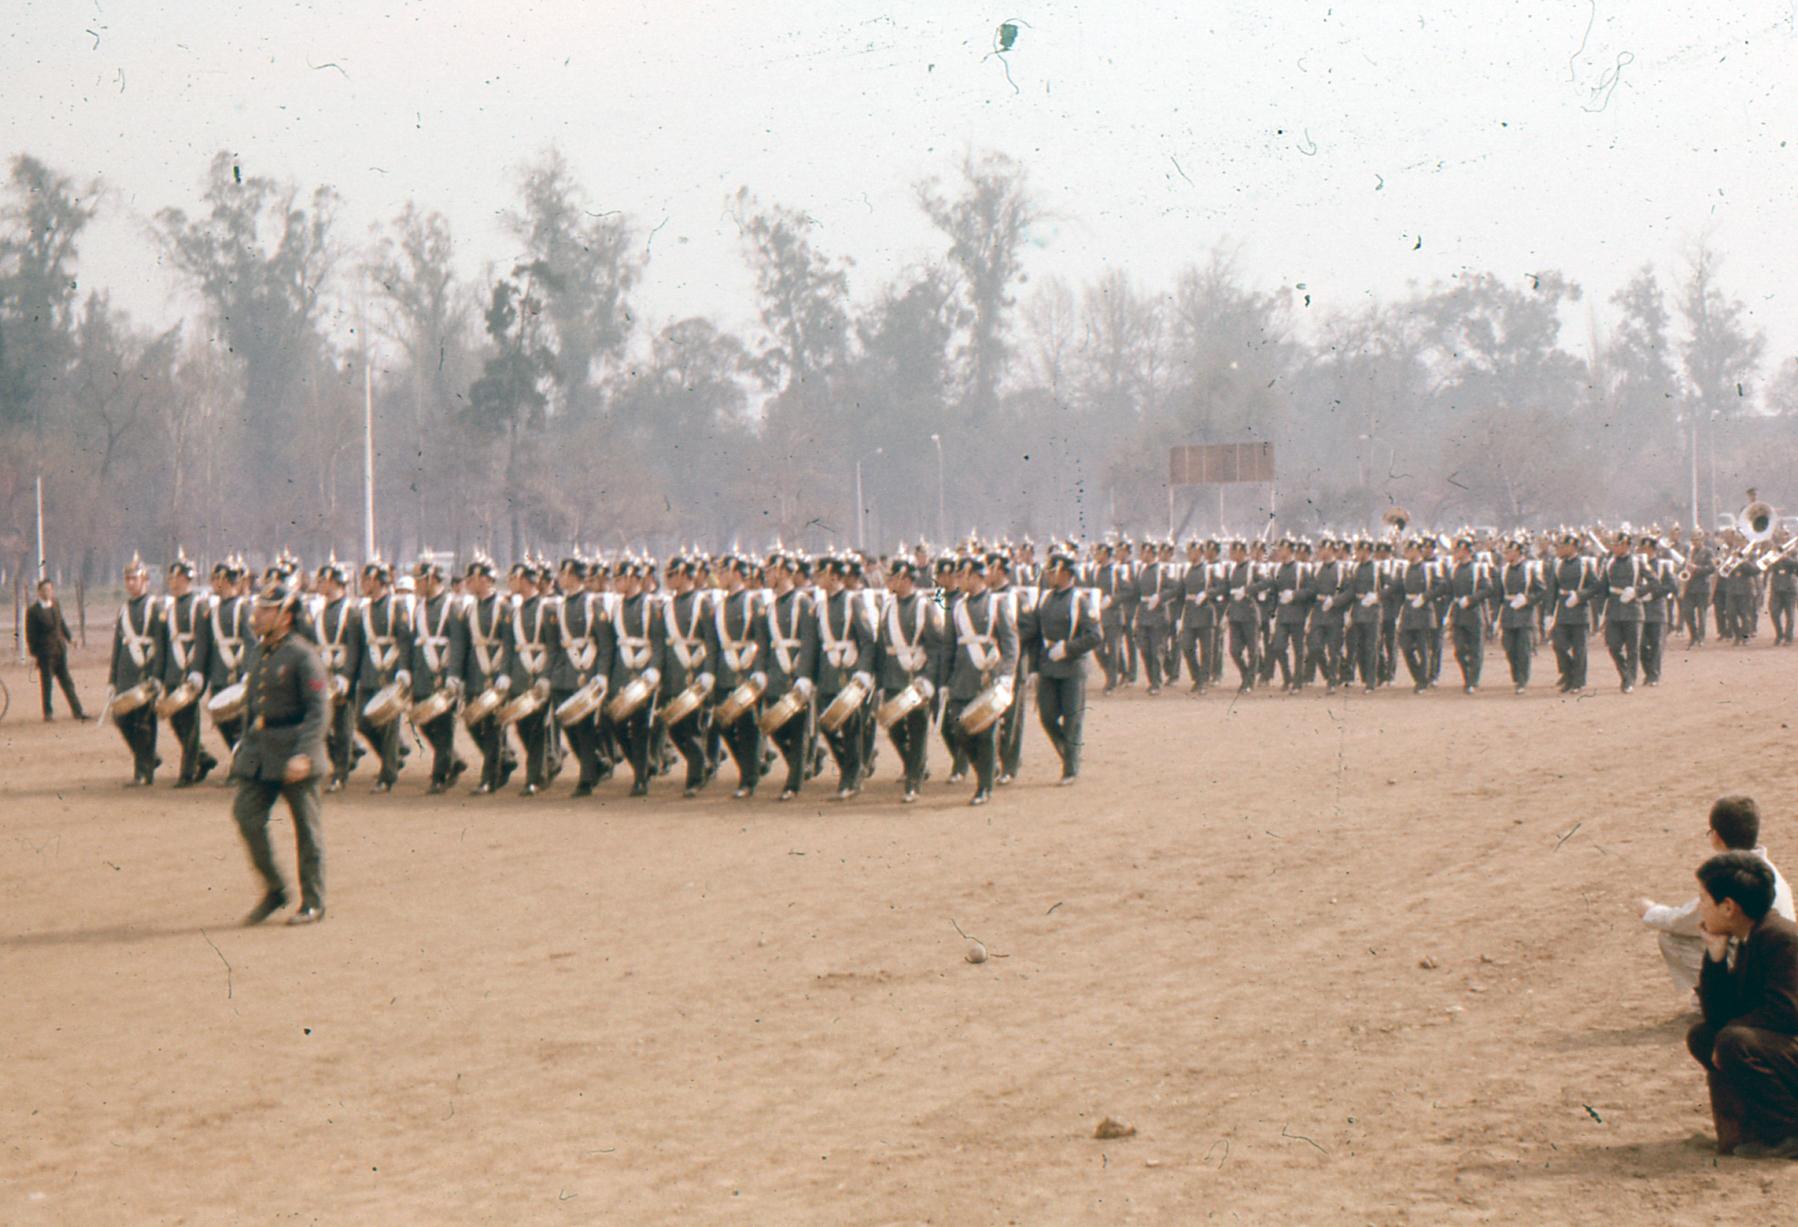 Enterreno - Fotos históricas de chile - fotos antiguas de Chile - Parada Militar, Septiembre de 1963